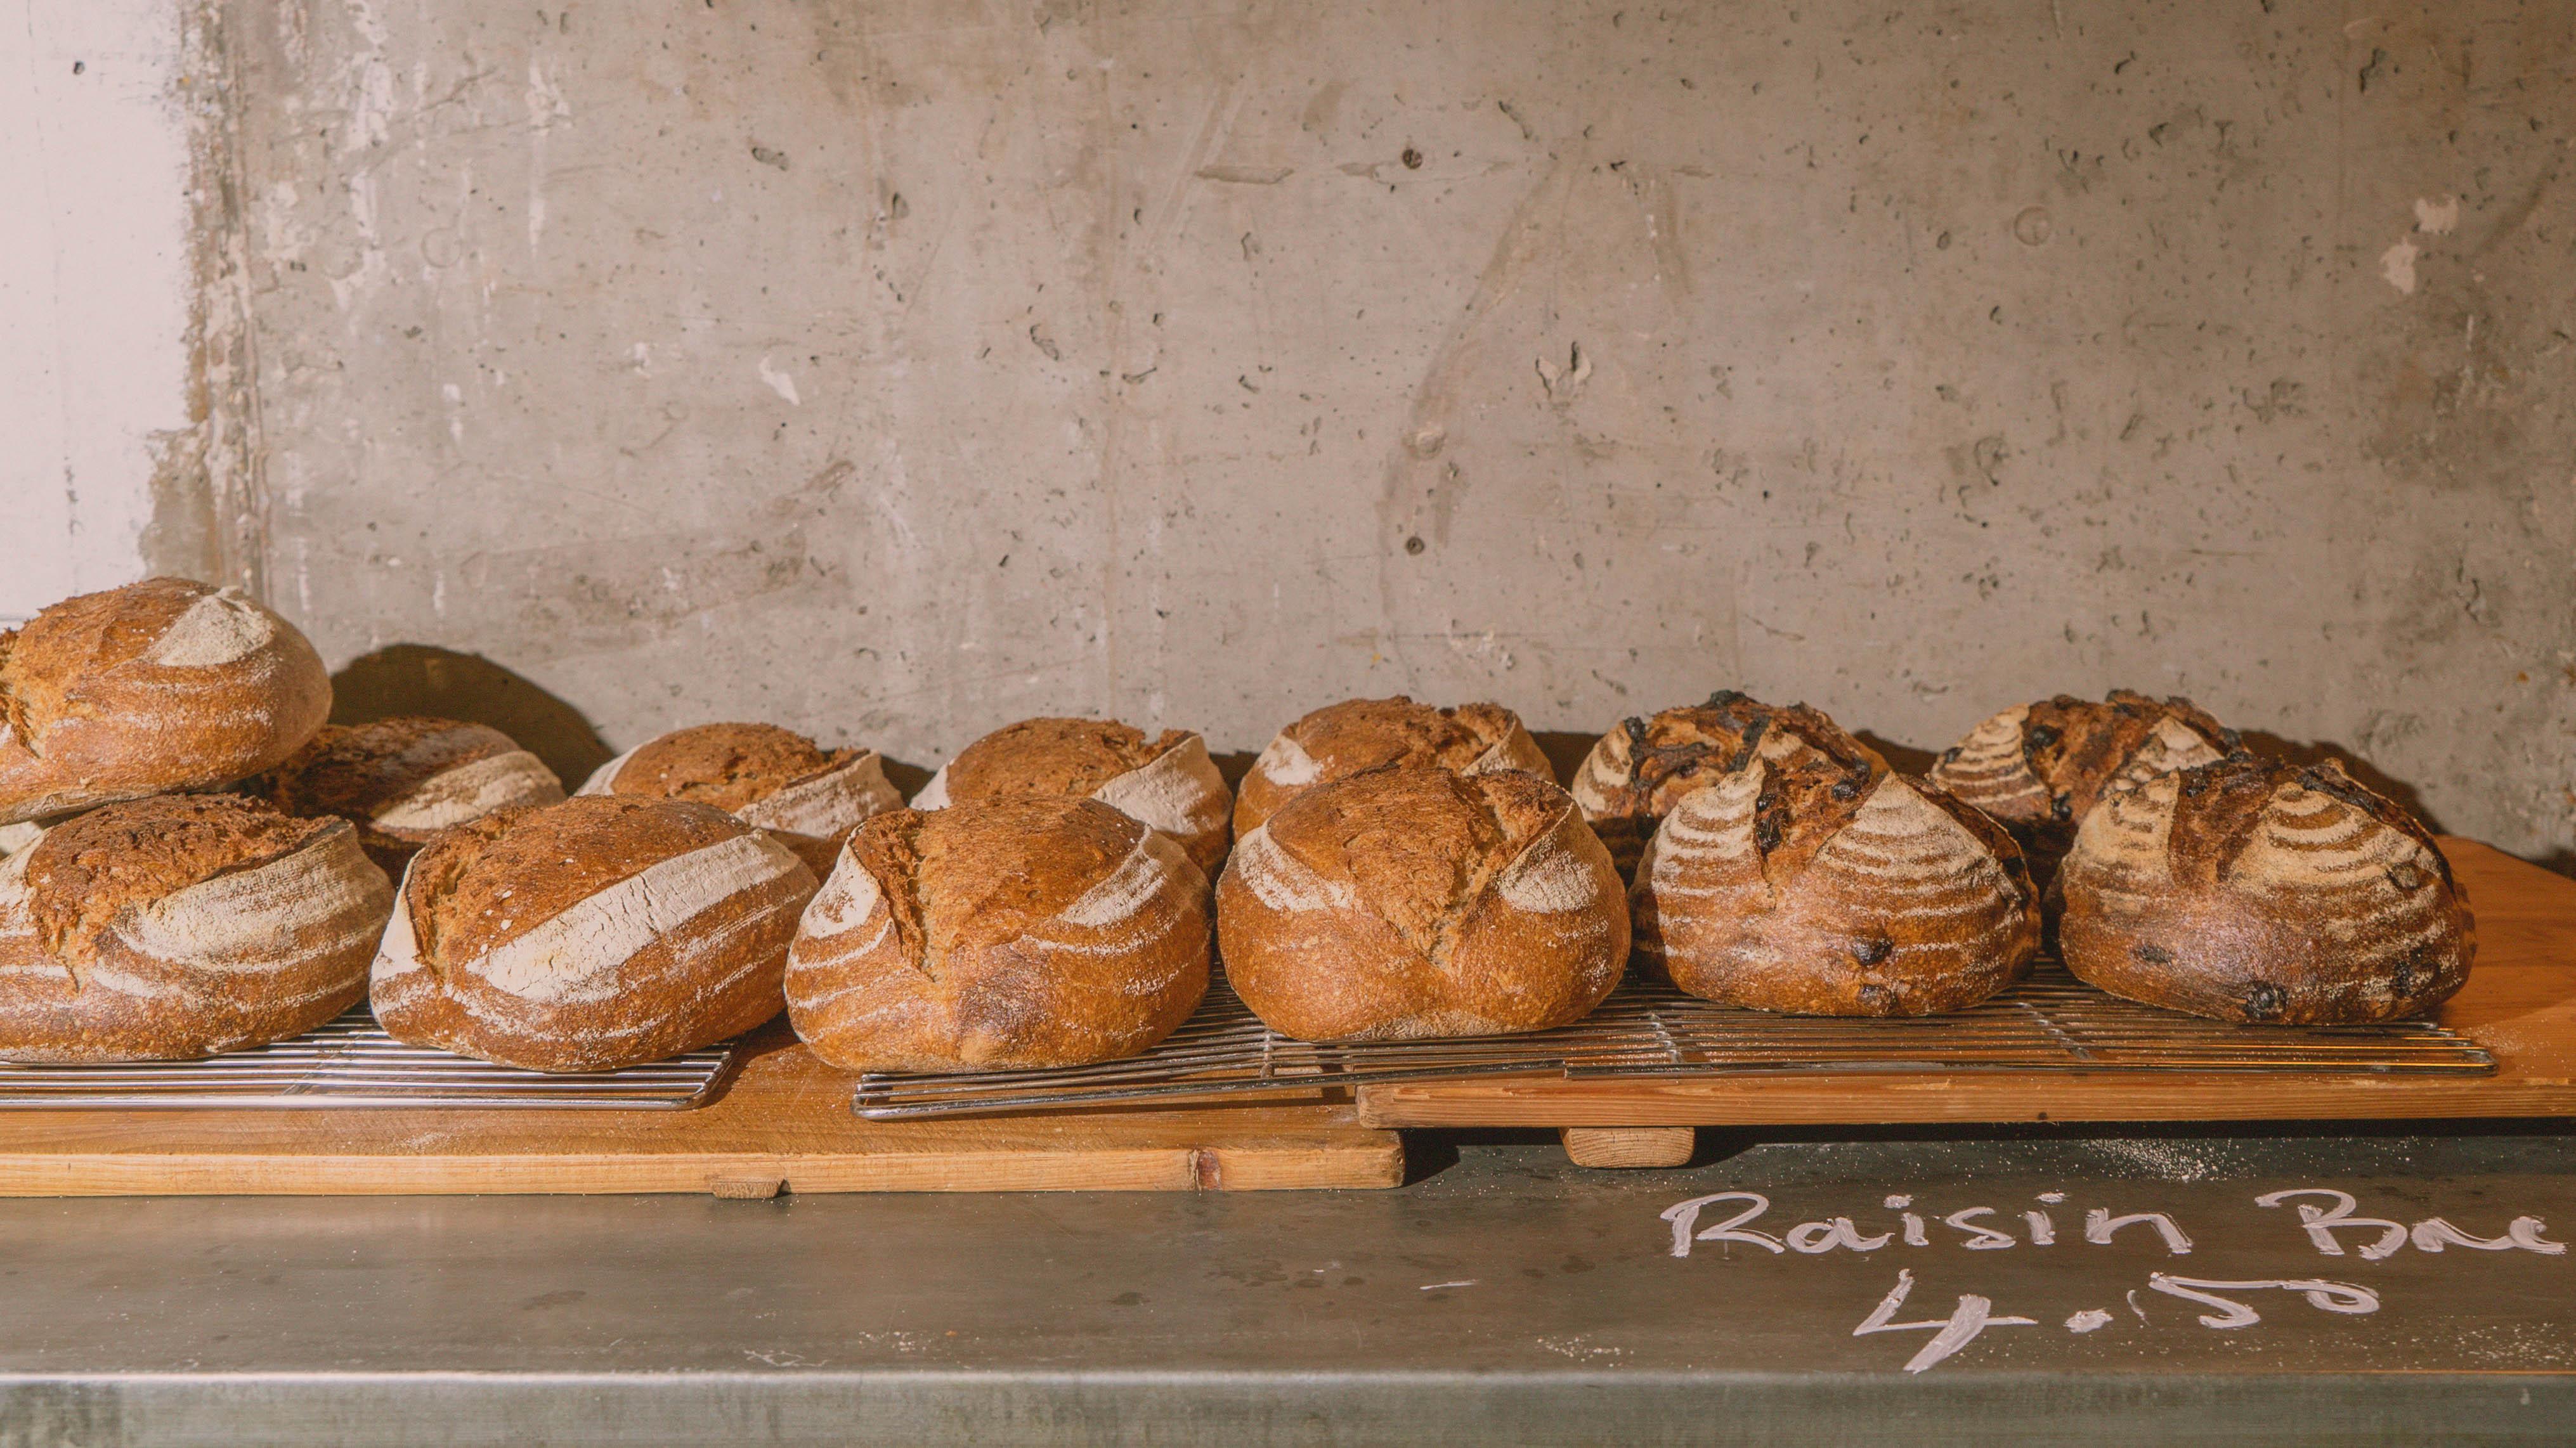 Raisin bread at Jolene bakery, restaurant and wine bar in Newington Green, London